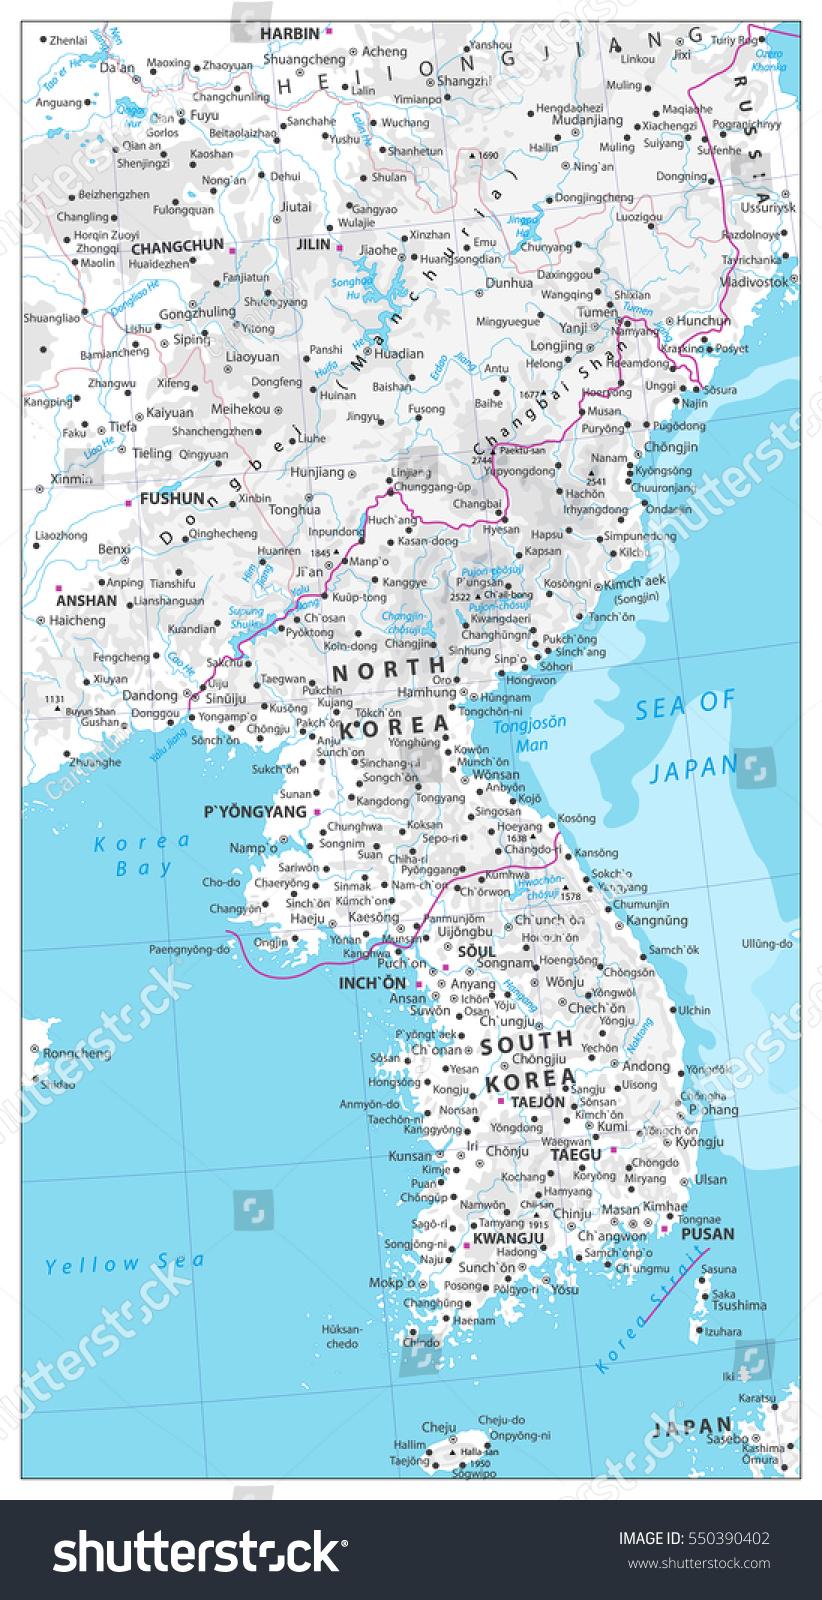 Korean Peninsula Map Physical Map Water Stock Vector - Haicheng map